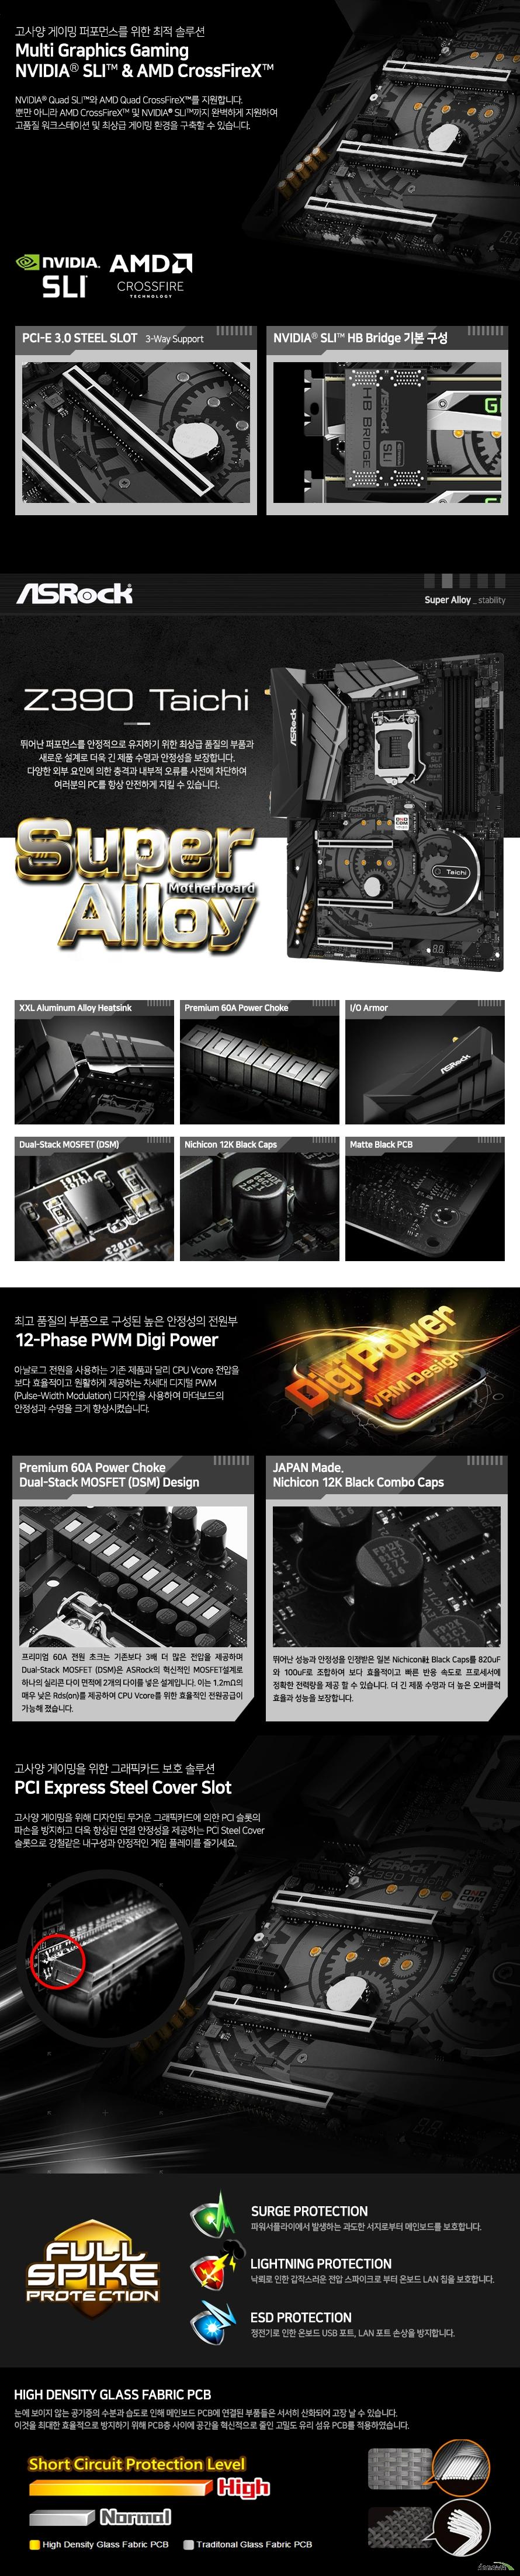 ASRock  Z390 TAICHI 디앤디컴